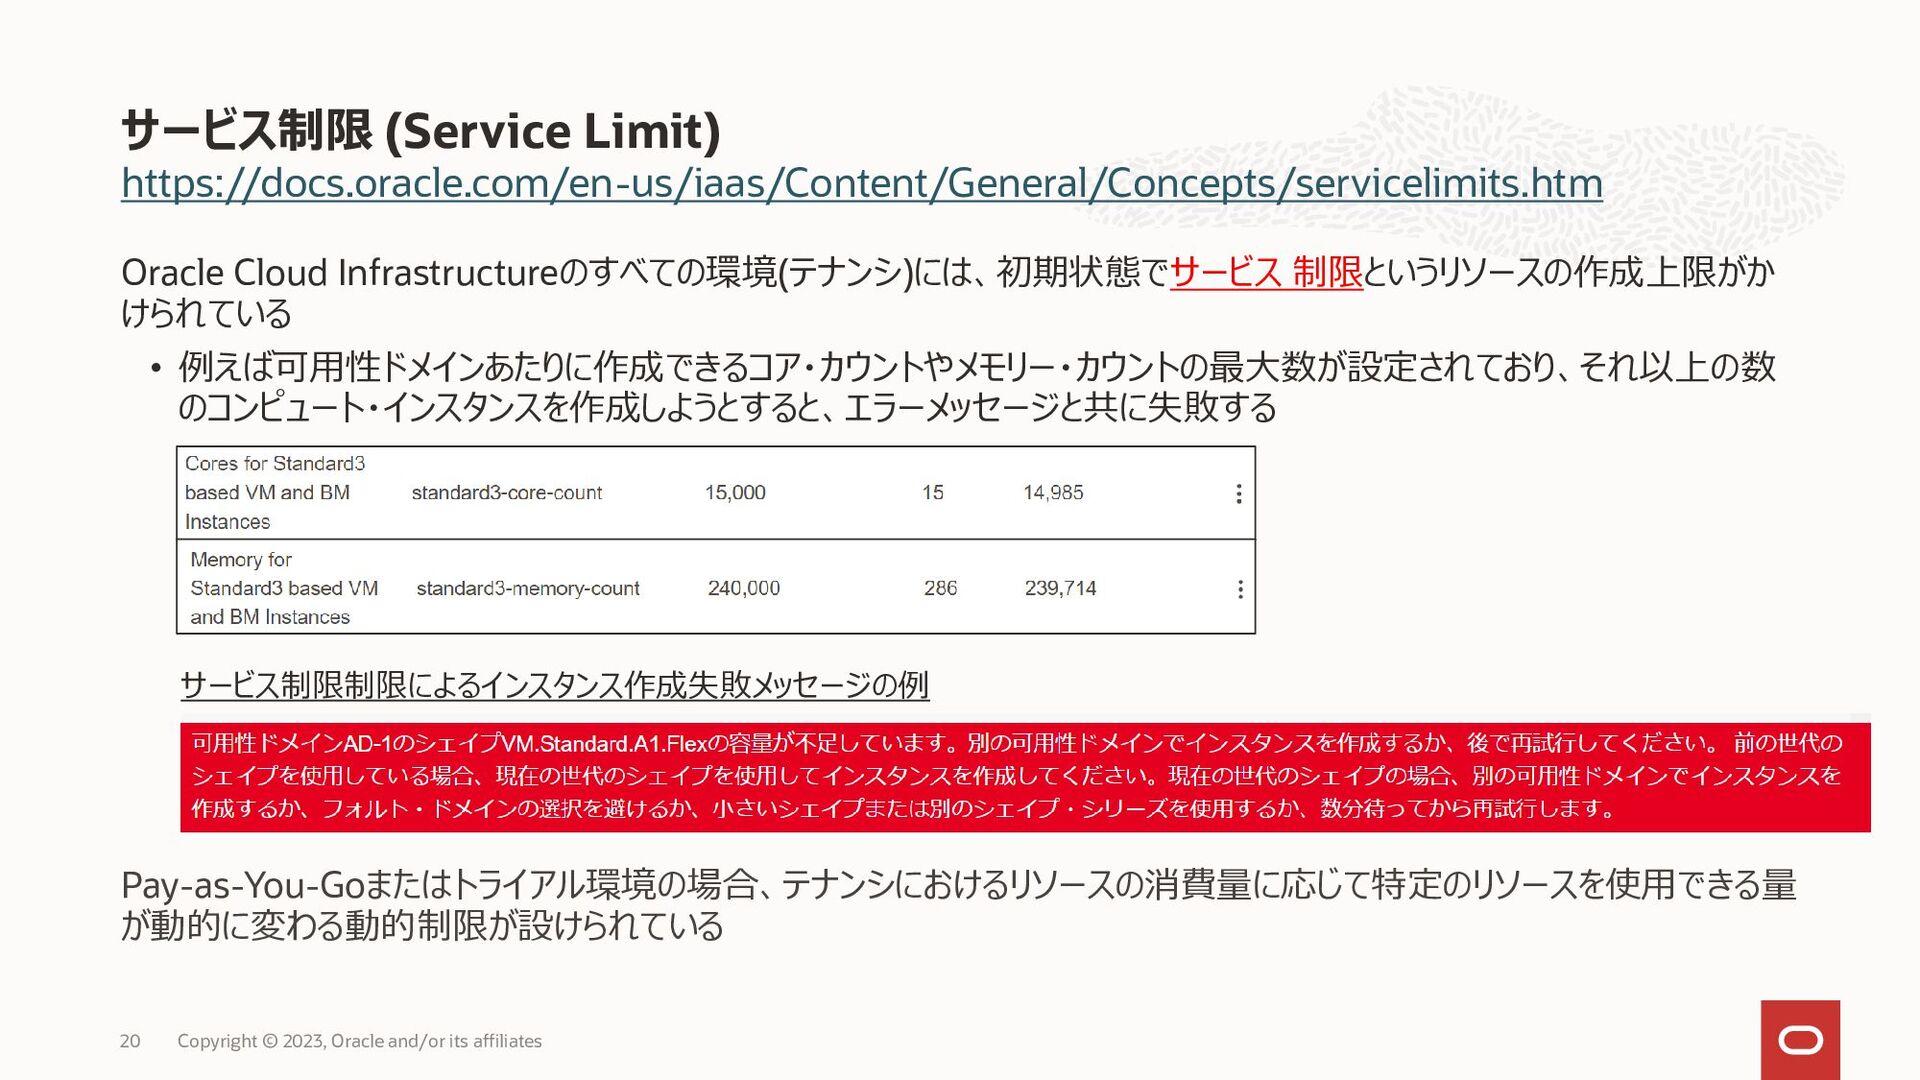 • • • • • • • & • • • • • VCN VCN • • (Service ...